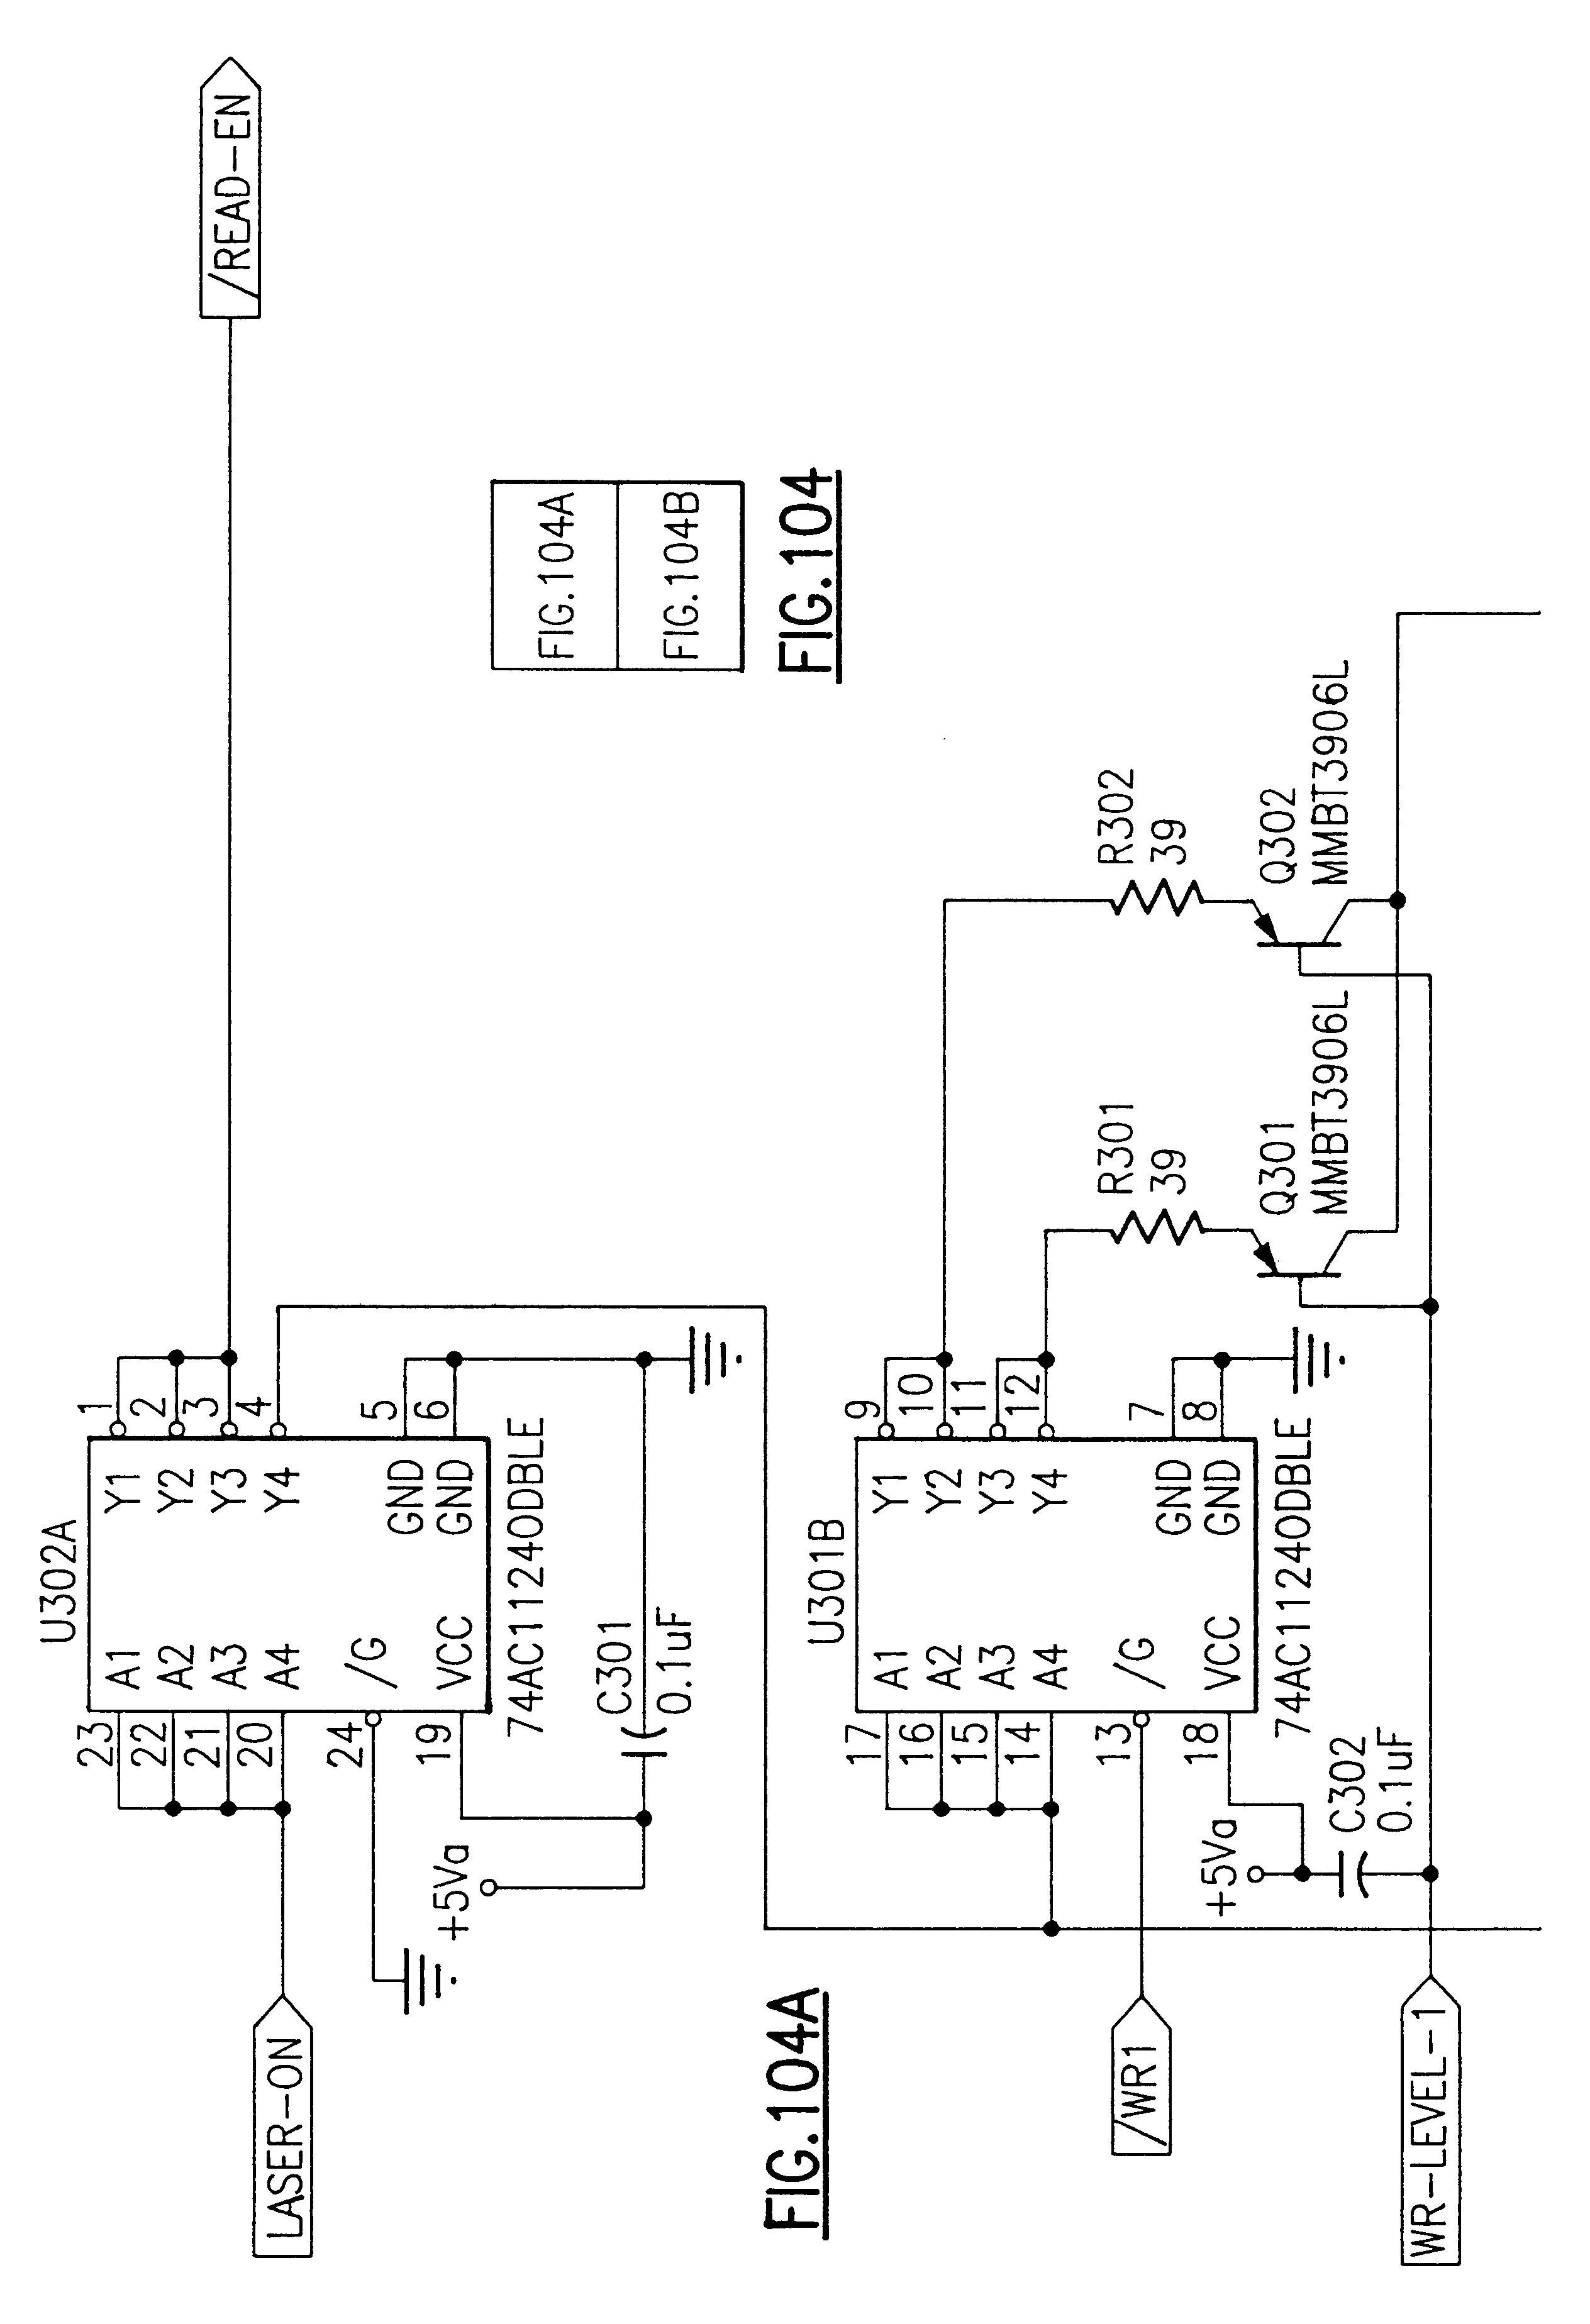 merit pioneer wiring diagrams patent us 6 278 665 b1  patent us 6 278 665 b1